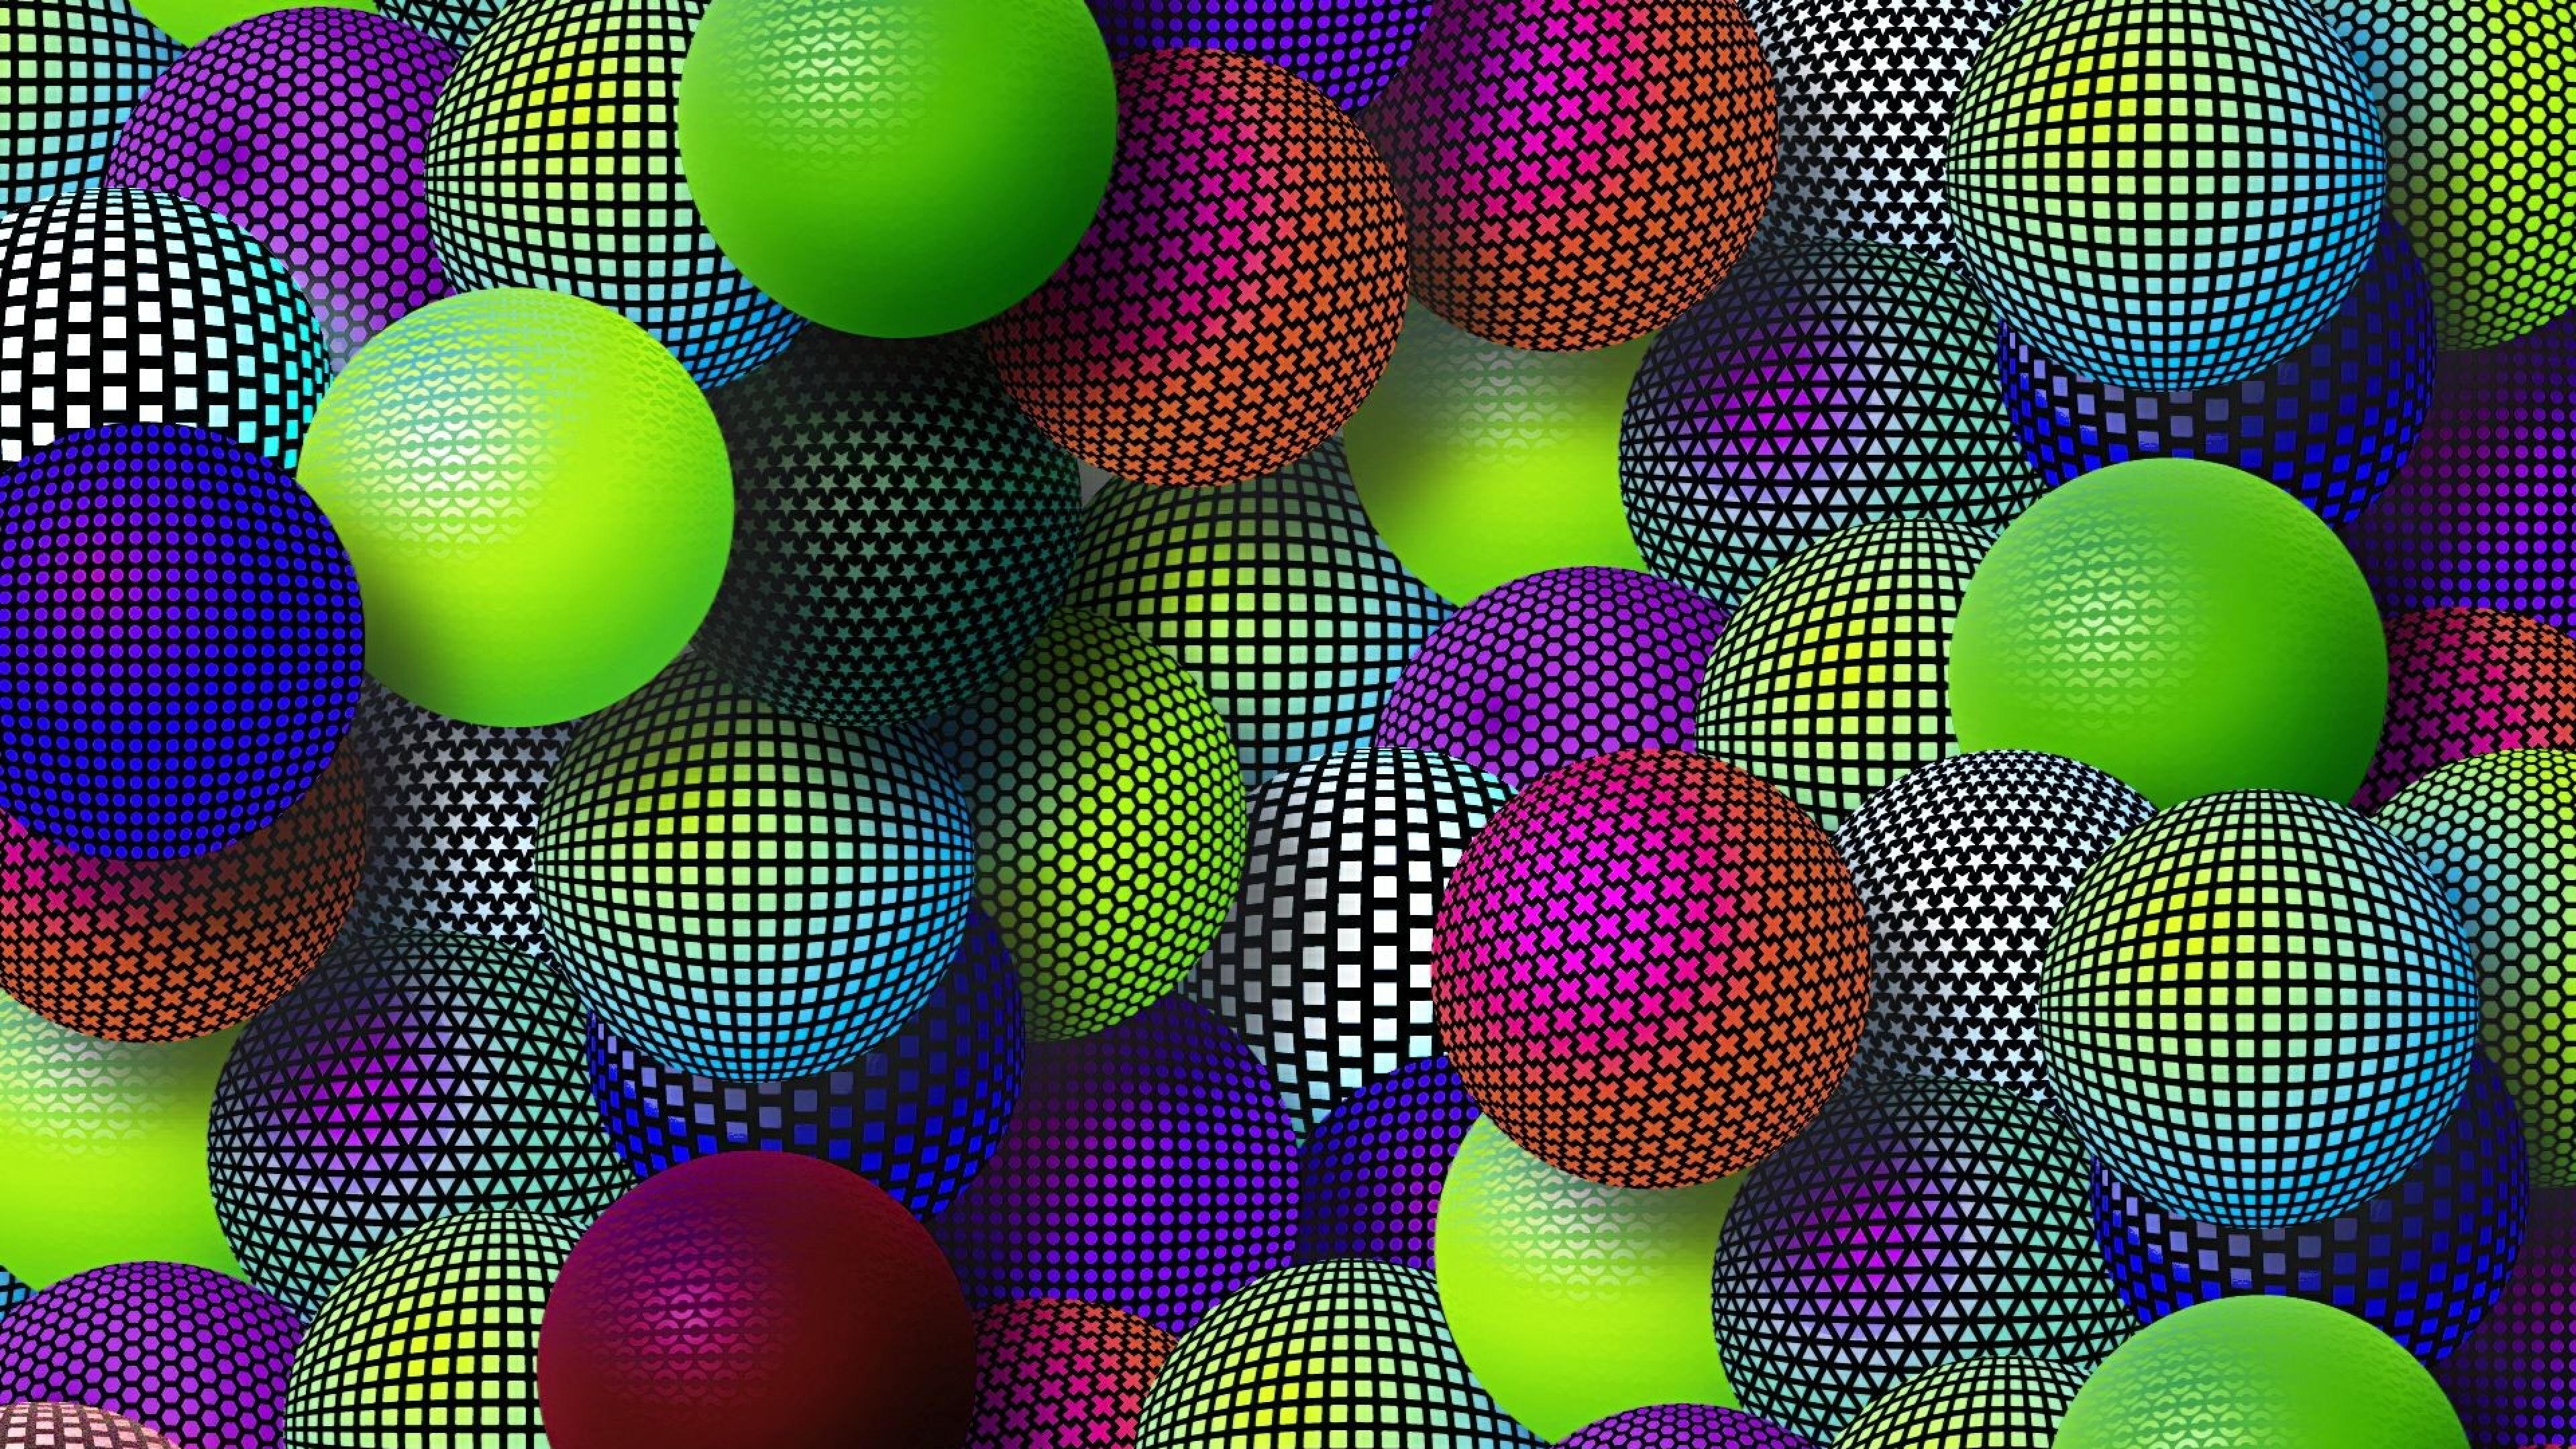 Download Wallpaper 3840x2160 Balloons Colorful Mesh Set Variety 4K 3840x2160